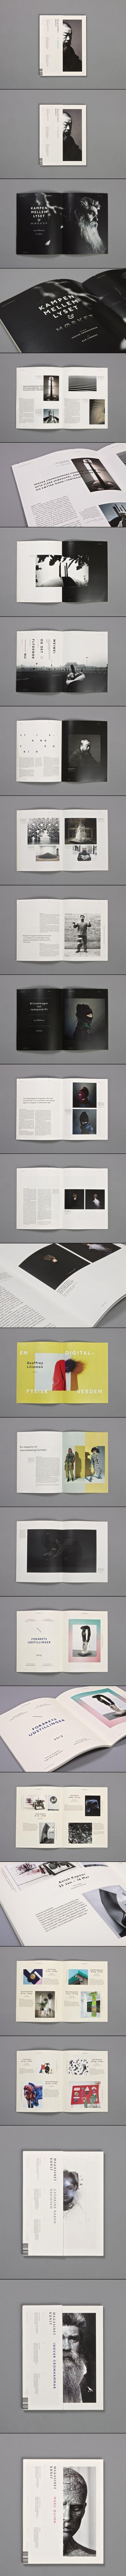 http://www.behance.net/gallery/Experimental-Brochure-El-infinito-ahora/10046257: